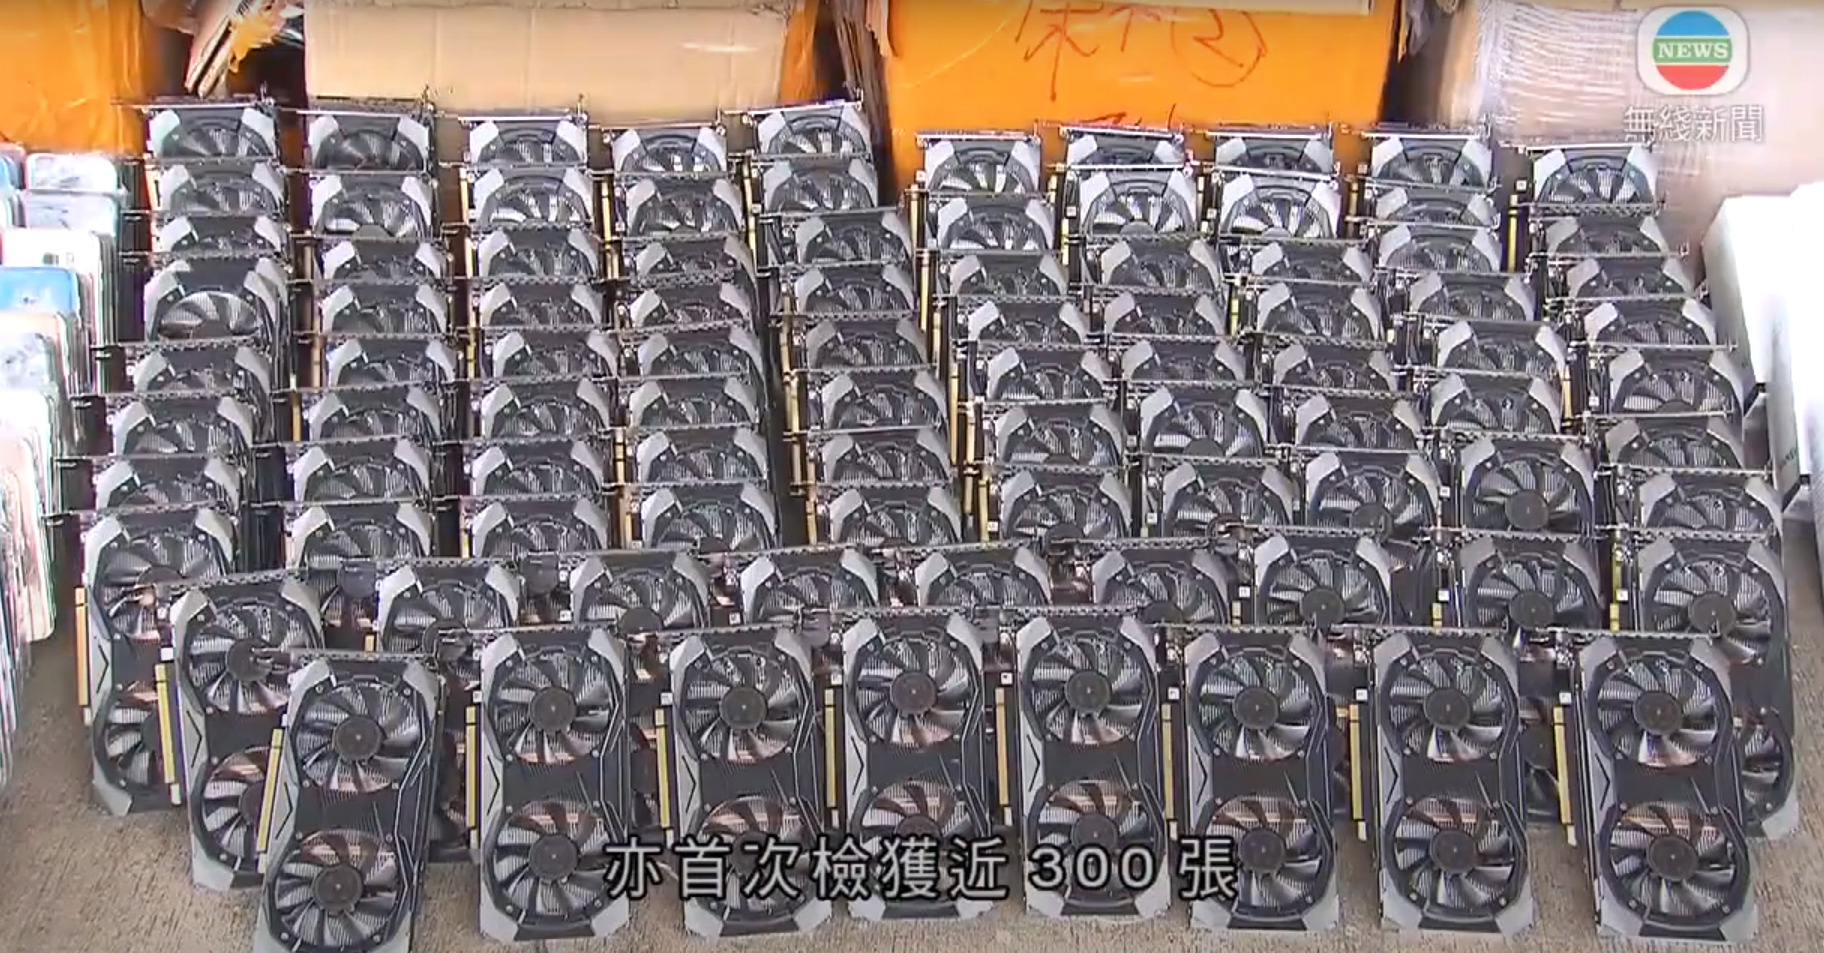 Hong Kong Customs seizes 300 crypto mining GPUs in anti-smuggling operations